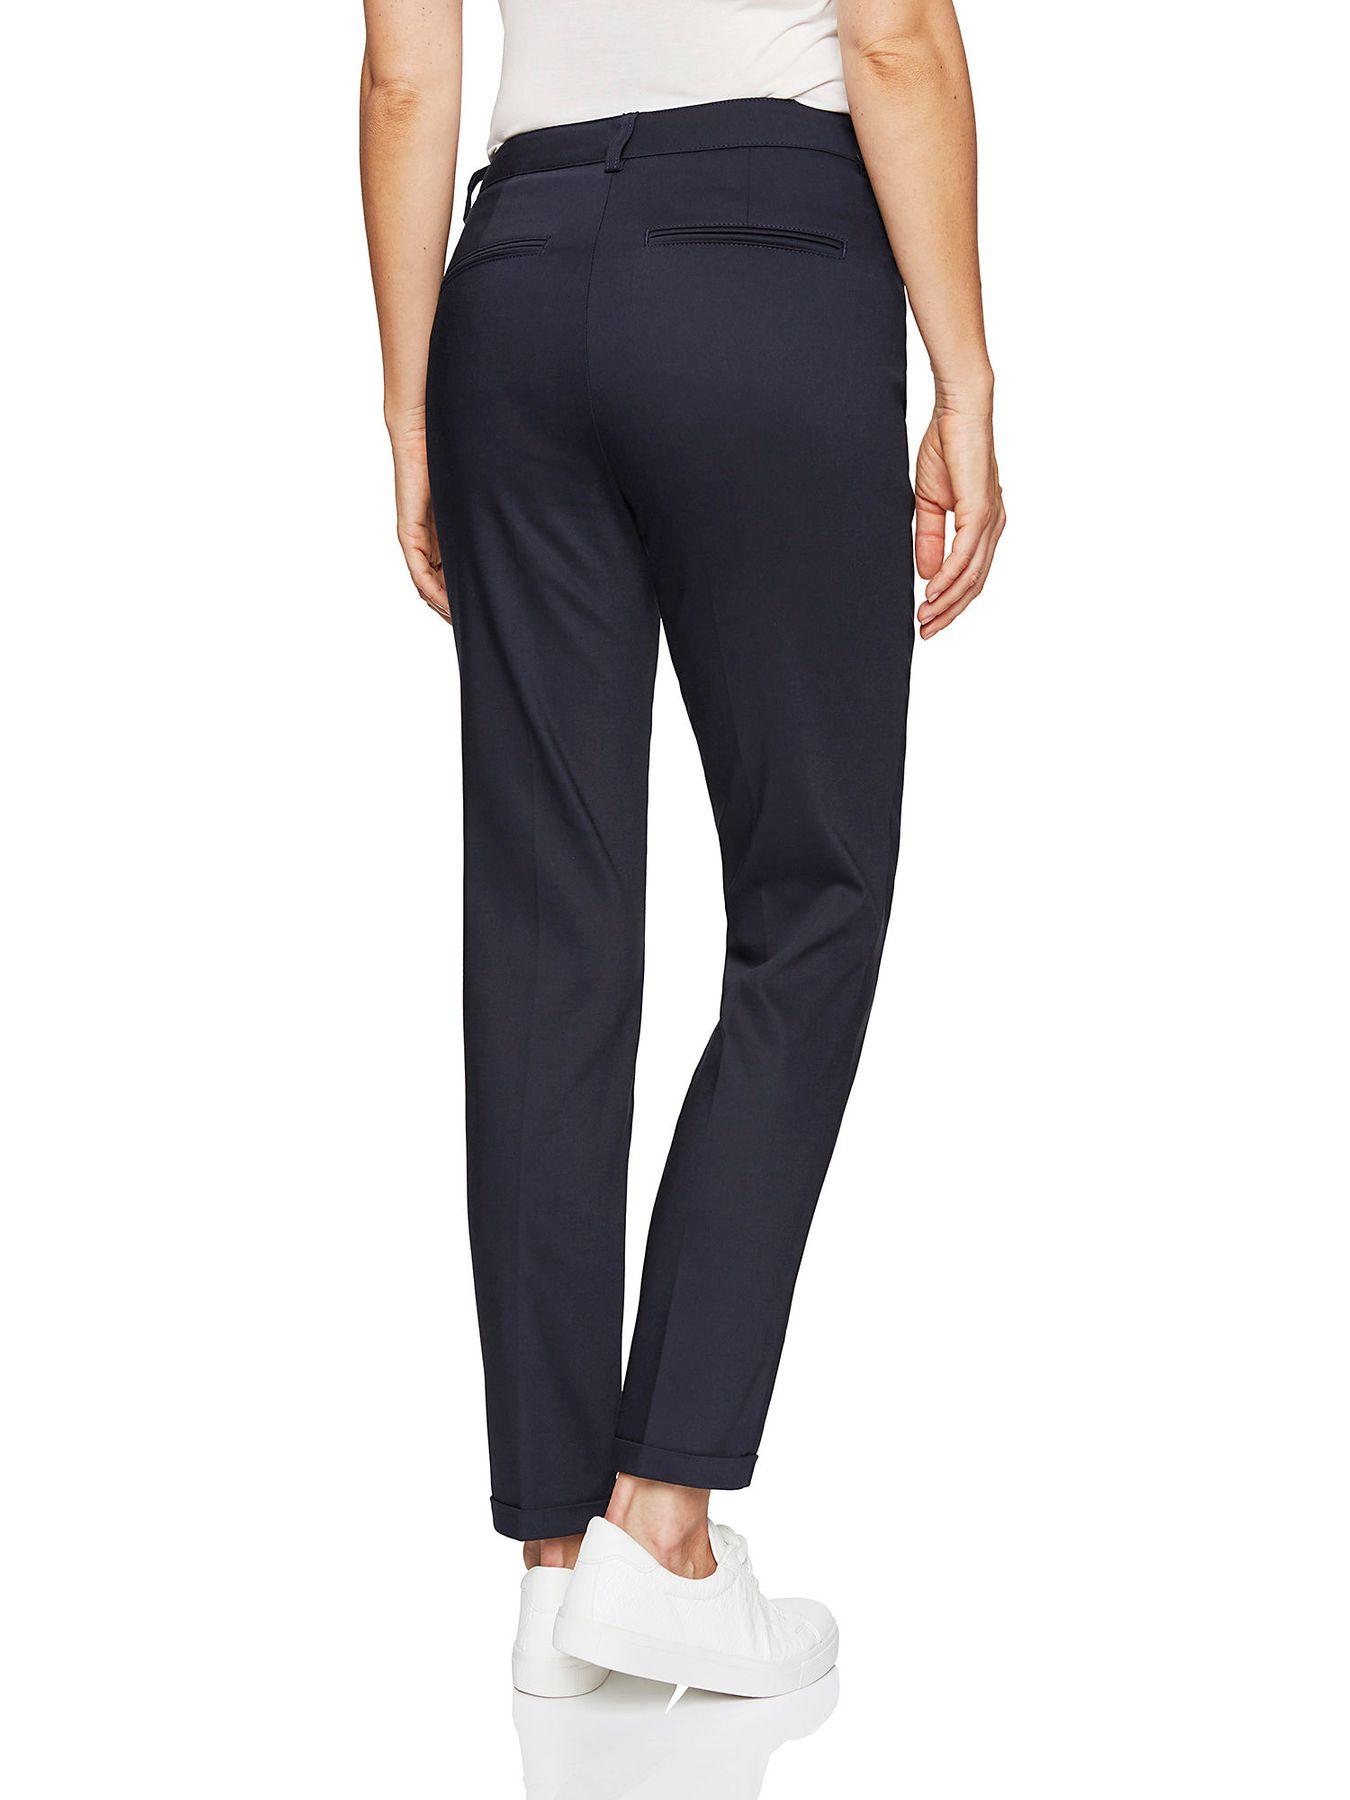 Atelier Gardeur - Slim Fit - Damen Röhrenhose aus Baumwoll-Materialmix in Marineblau Denise  (600411) – Bild 4